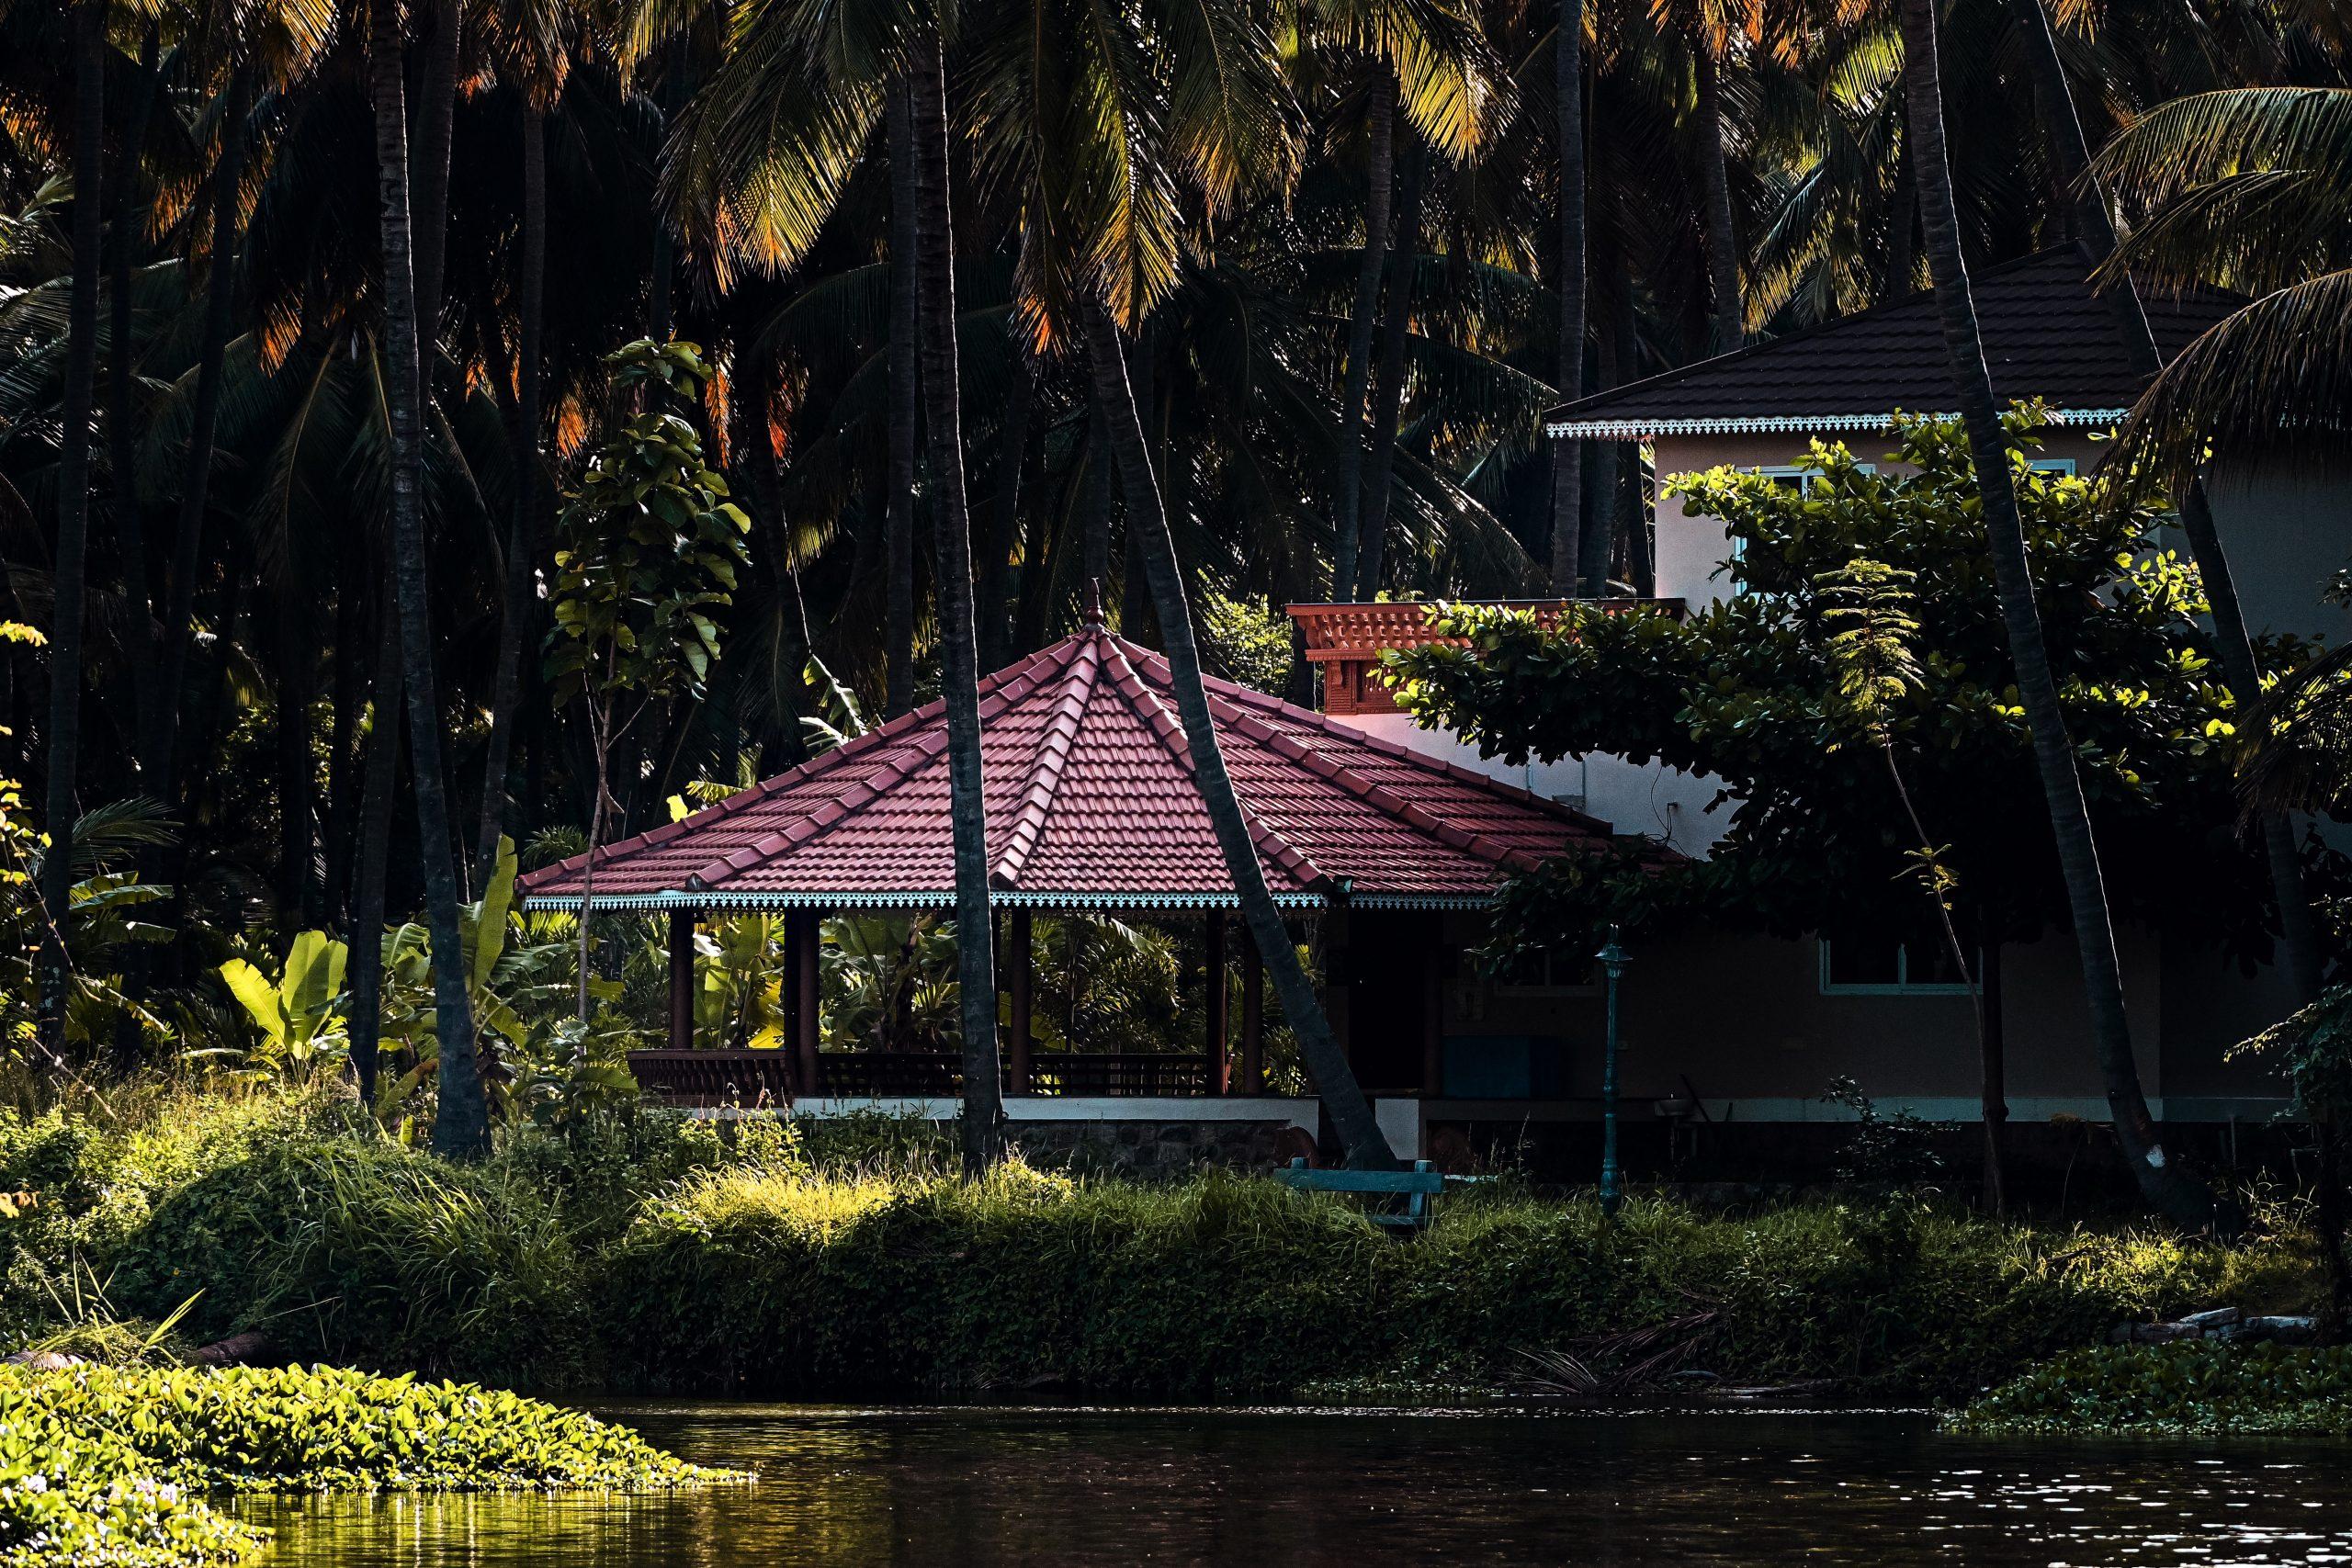 A farmhouse on the lakeside